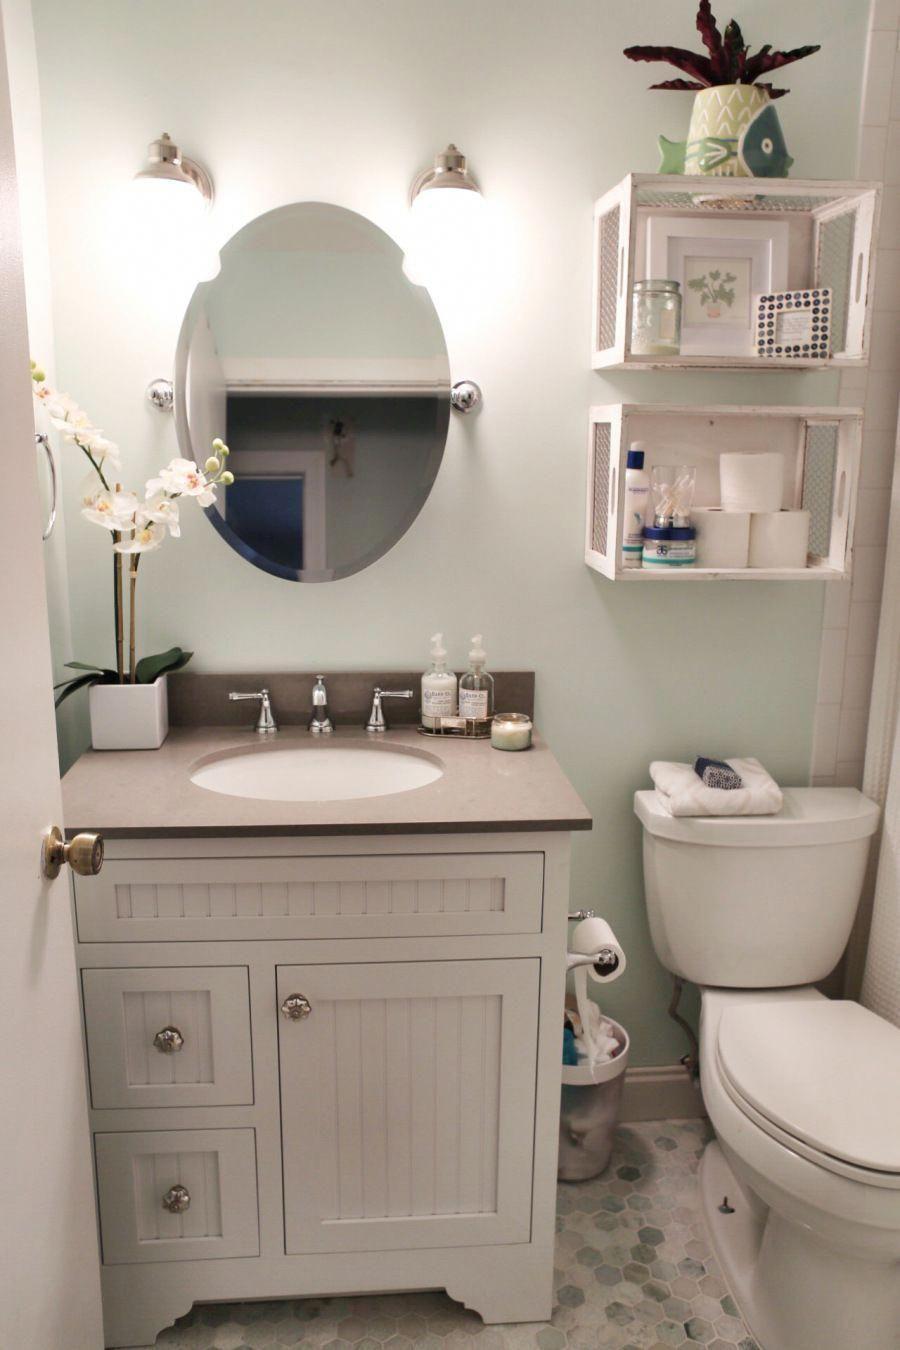 Restroom Decor Ideas Fashion Bathroom Decor Bathroom Storage Decor 20190115 Beautiful Bathroom Designs Small Bathroom Small Bathroom Decor